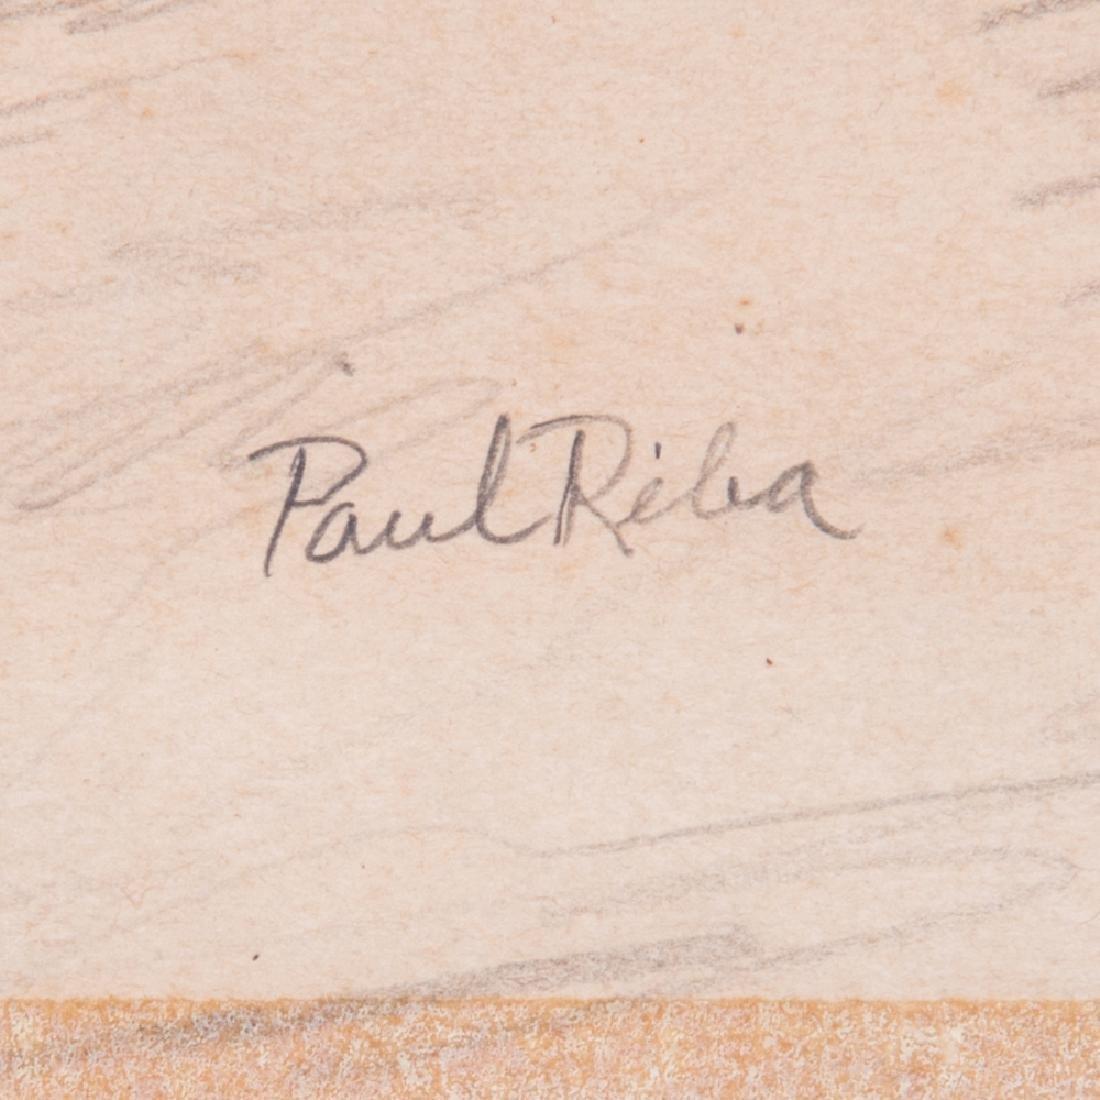 Paul Riba (1912-1977) A Group of Three Studies, Pencil - 3